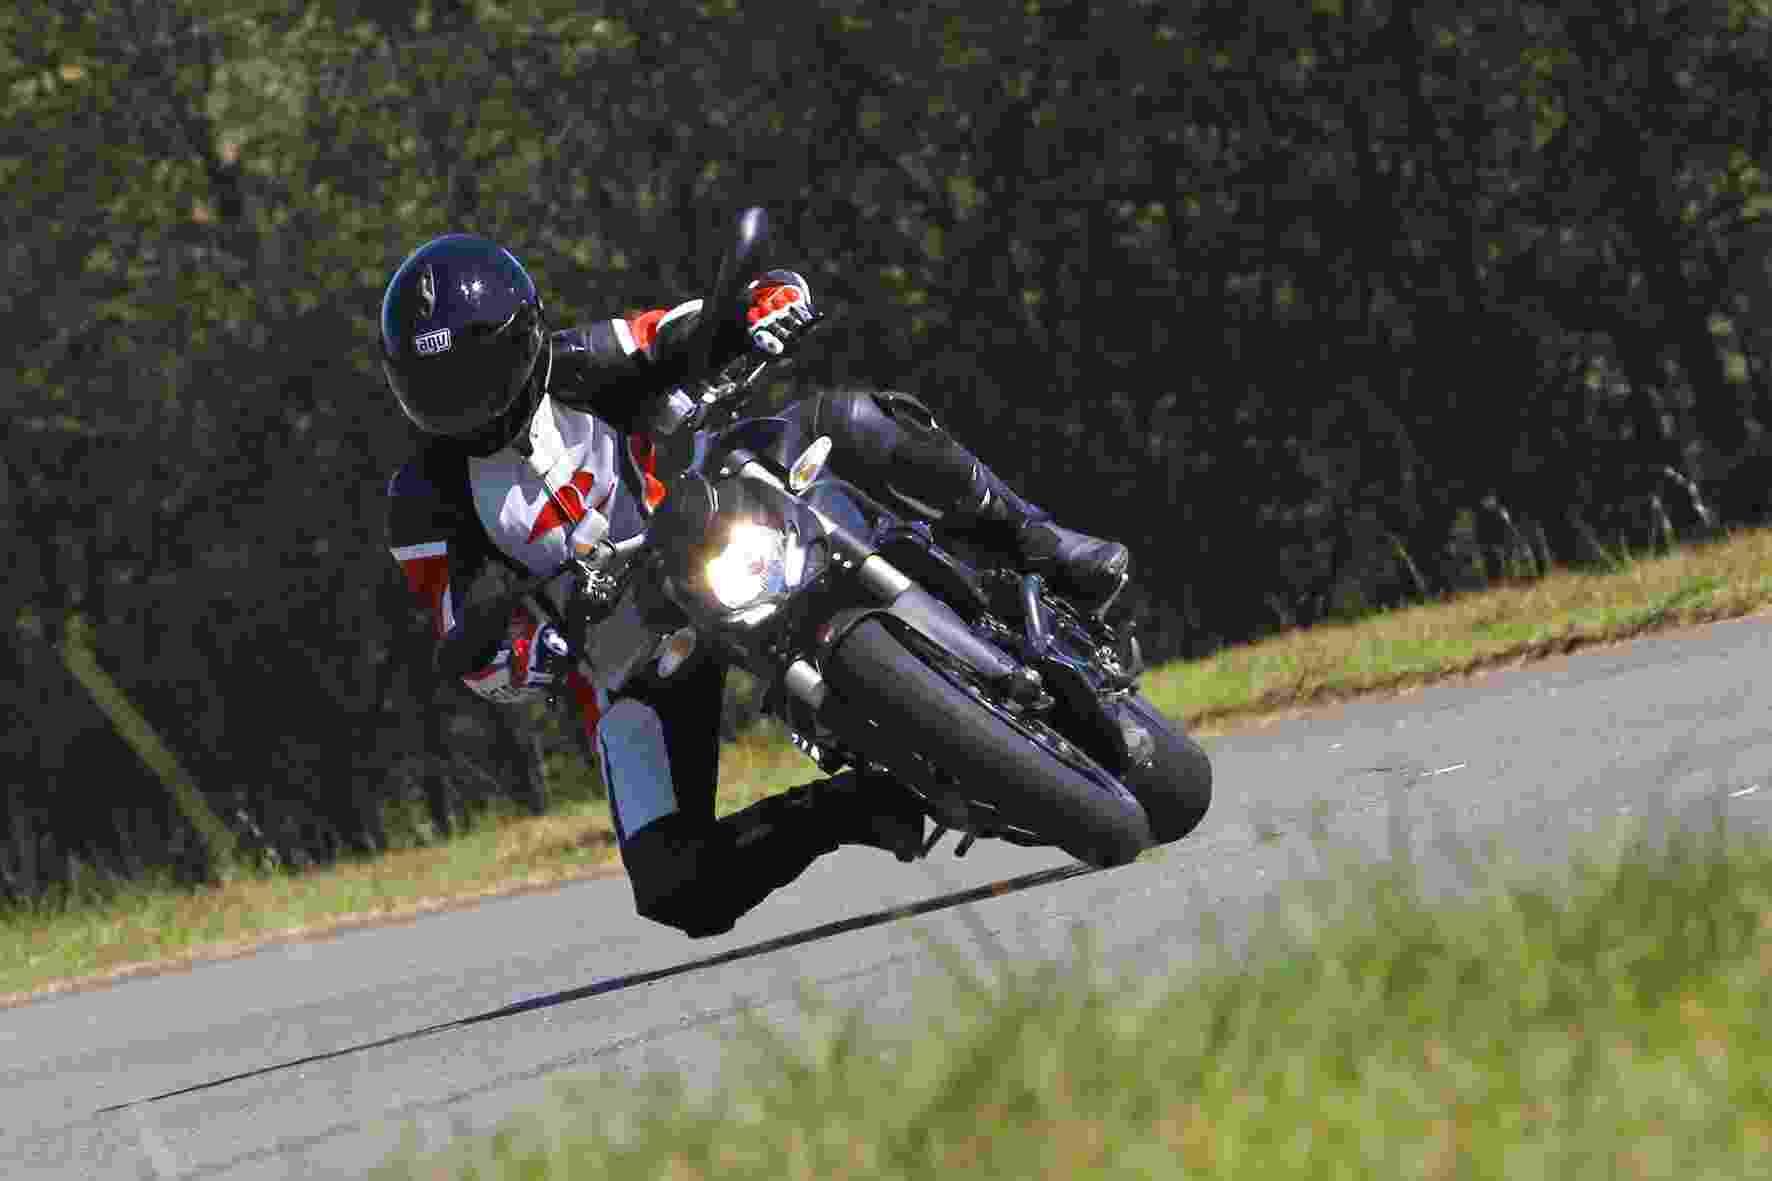 Ducati Streetfighter 848 - Mario Villaescusa/Infomoto